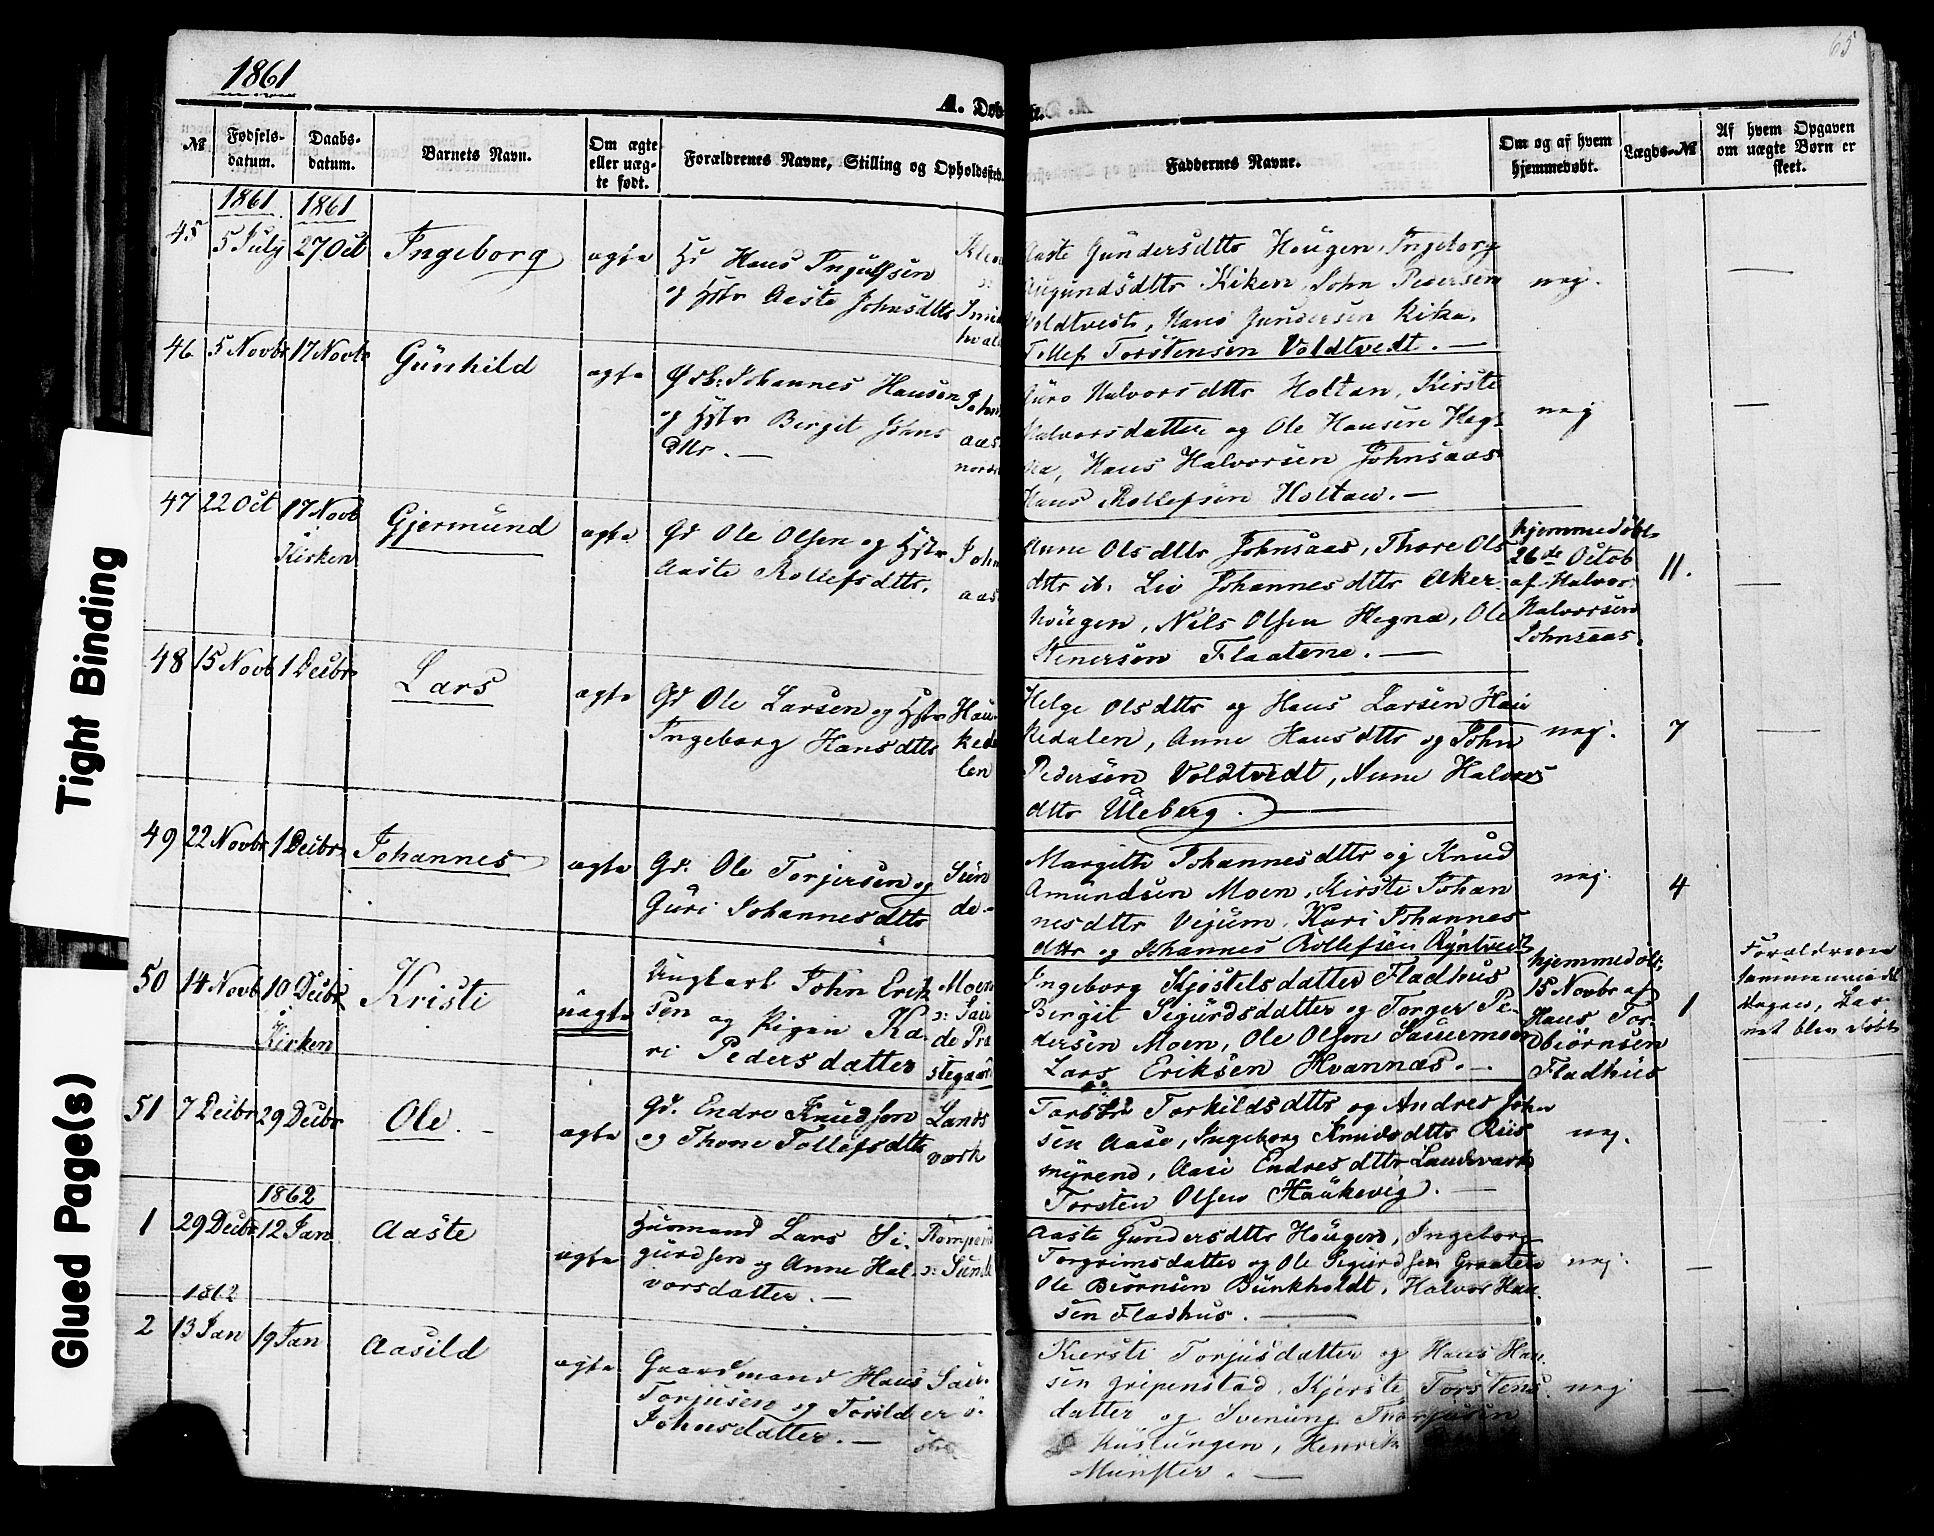 SAKO, Sauherad kirkebøker, F/Fa/L0007: Ministerialbok nr. I 7, 1851-1873, s. 65